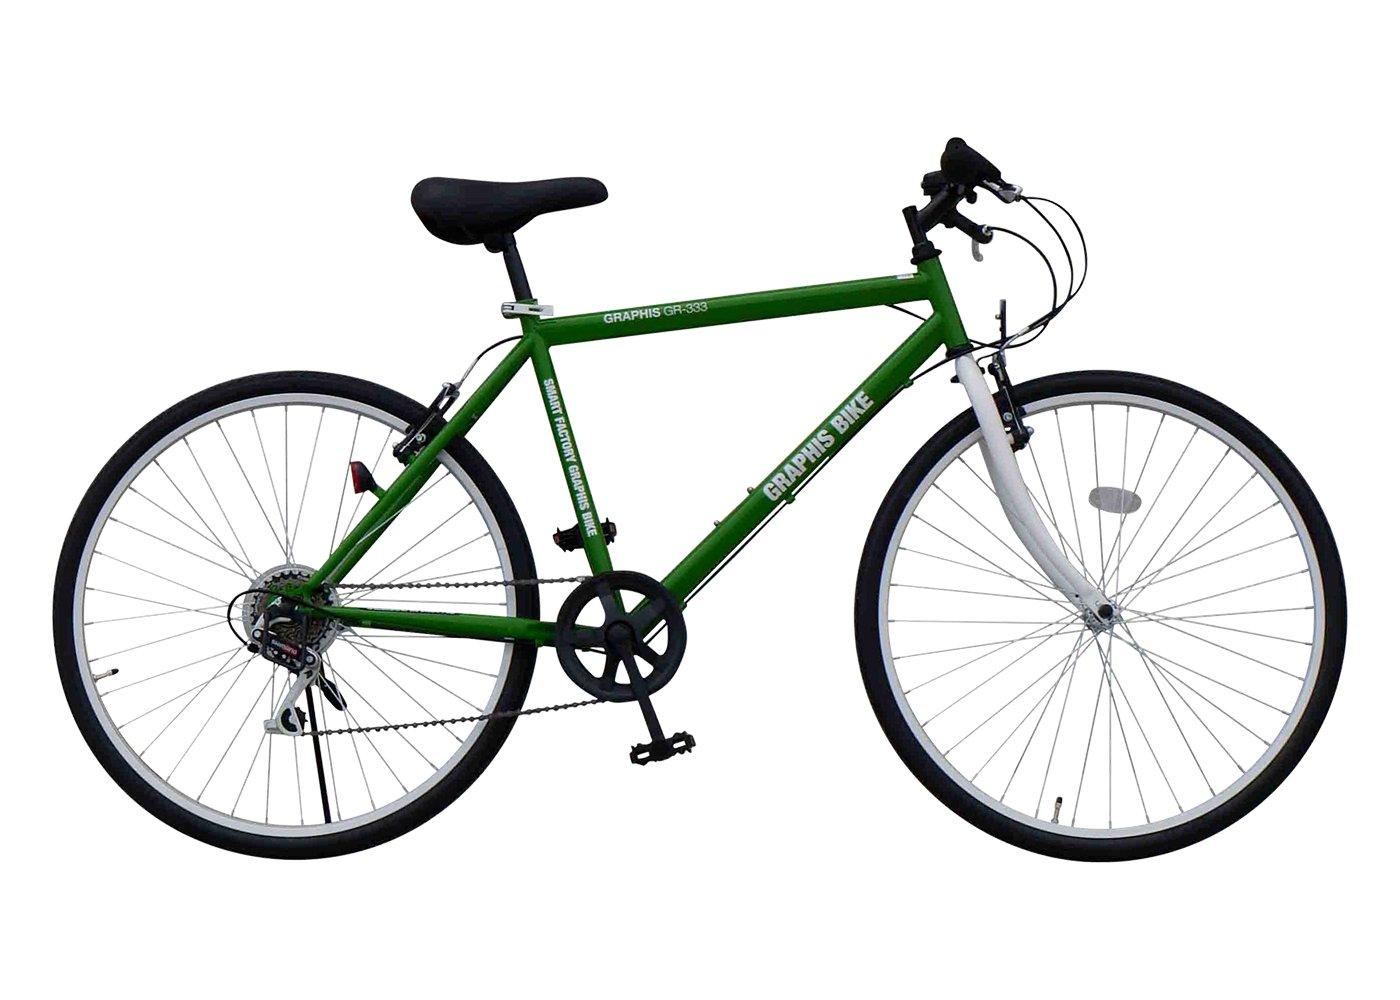 GRAPHIS(グラフィス) クロスバイク 26インチ 6段変速 GR-333 B00HVTJF6S グリーン グリーン